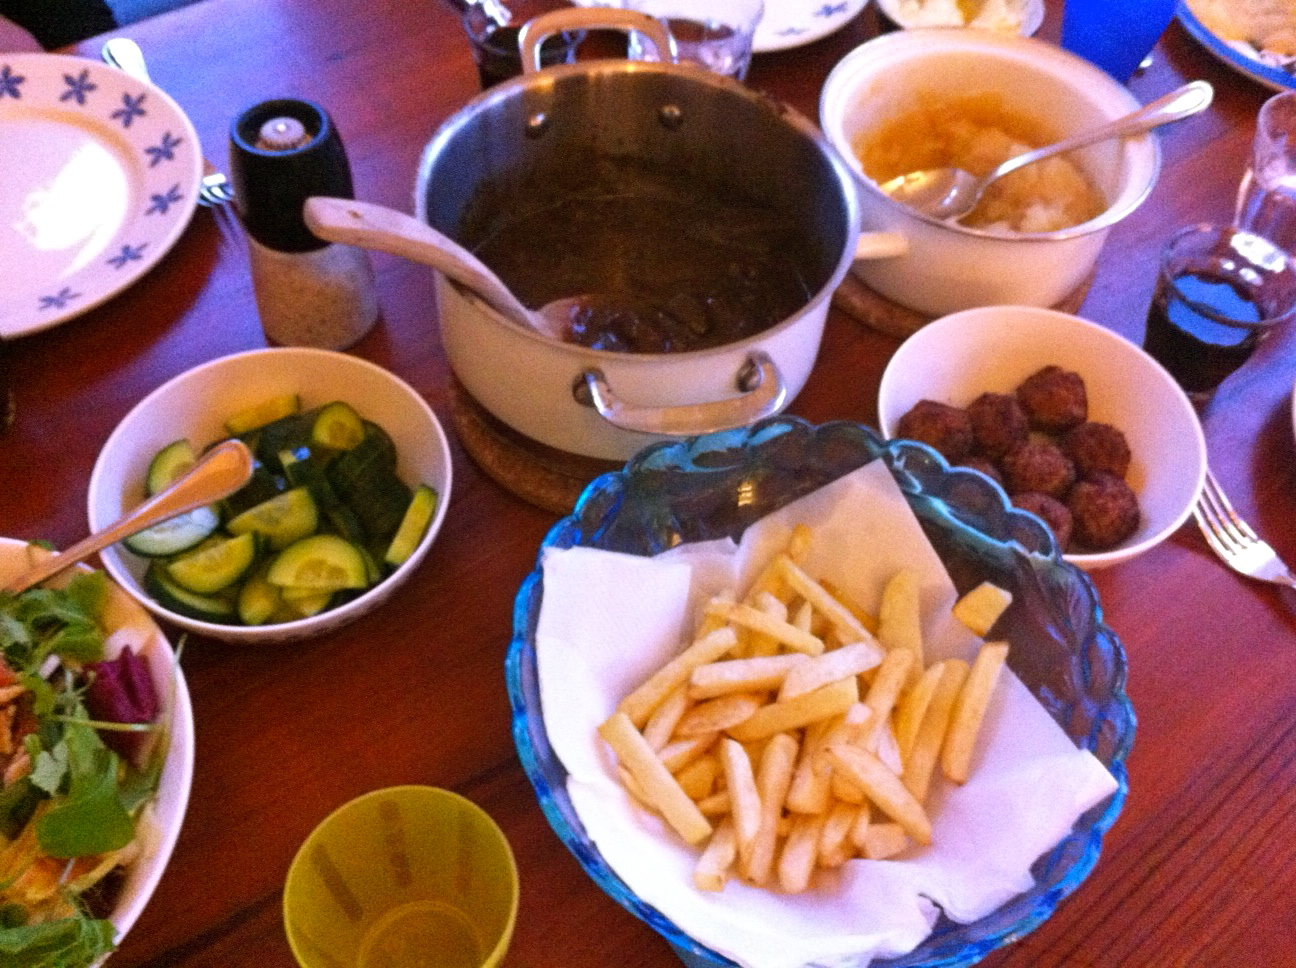 tafel patat moes paard mayo